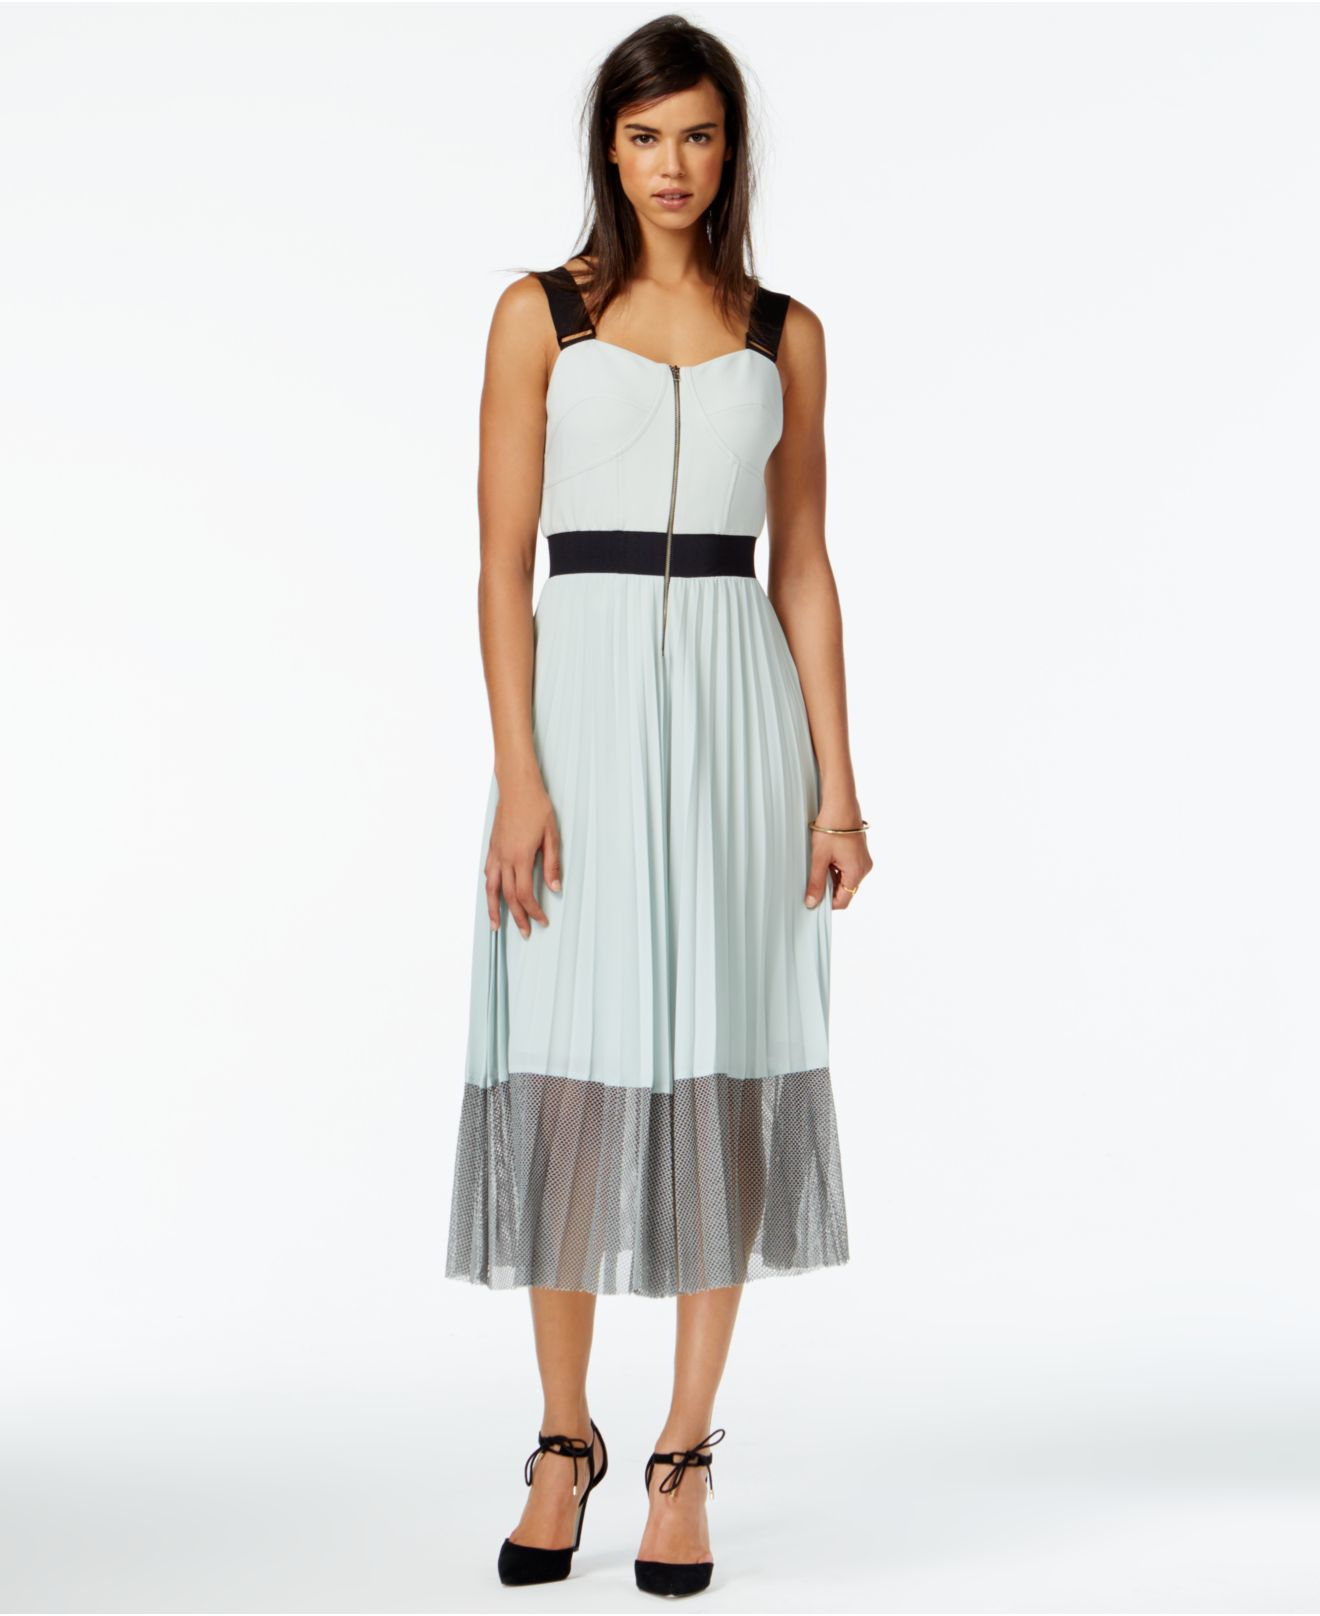 Lyst - RACHEL Rachel Roy Colorblocked Pleated Midi Dress in Green 4eb083294